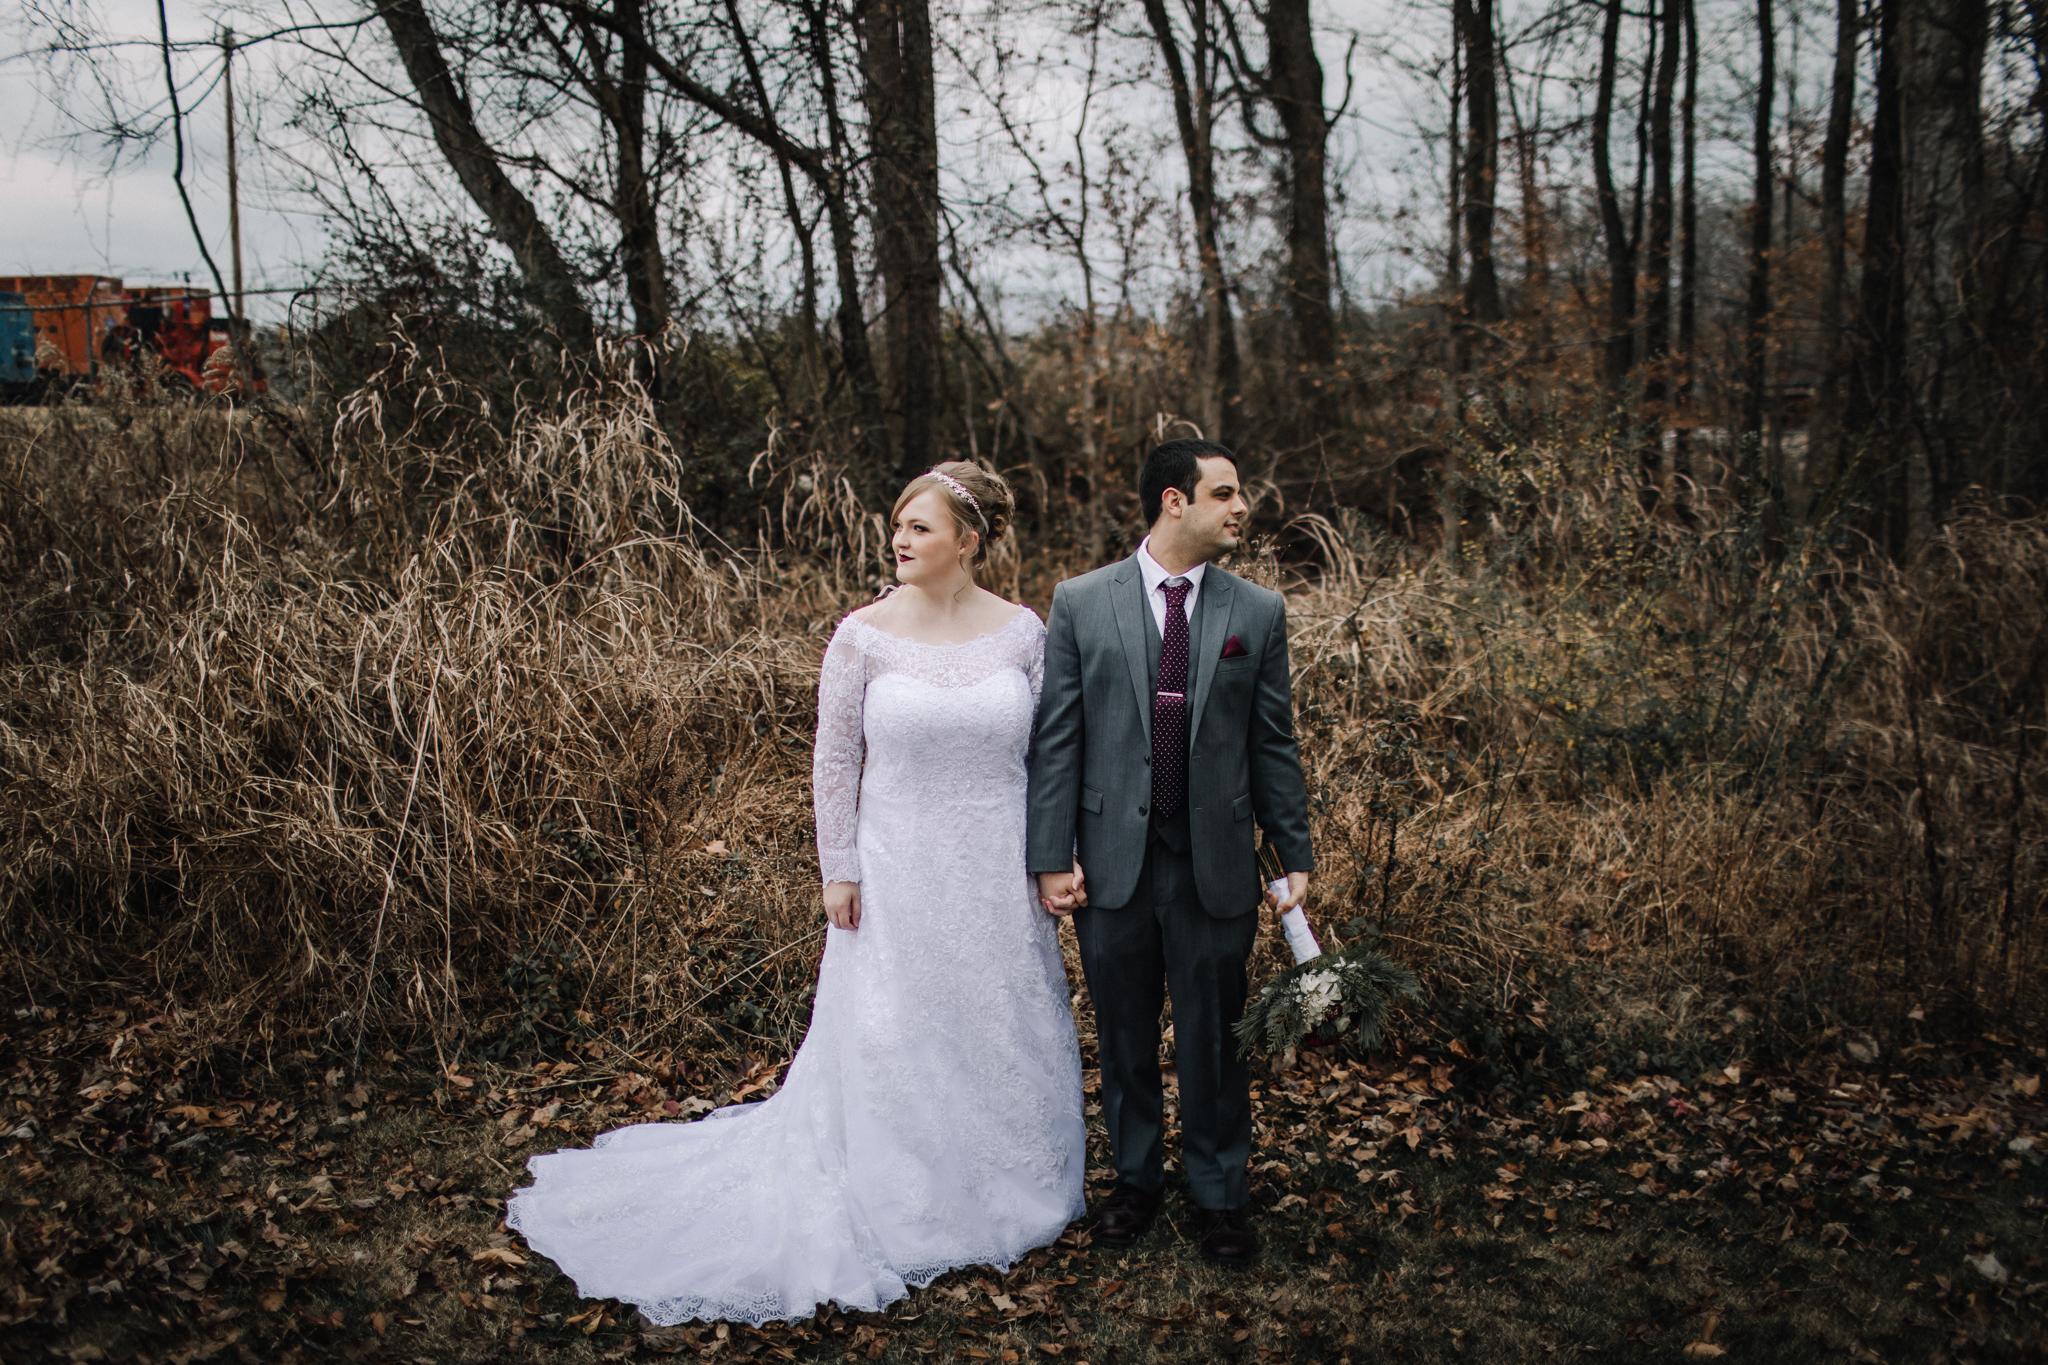 billie-shaye-style-photography-www.billieshayestyle.com-winter-wedding-the-belle-hollow-clarksville-tennessee-9187.jpg